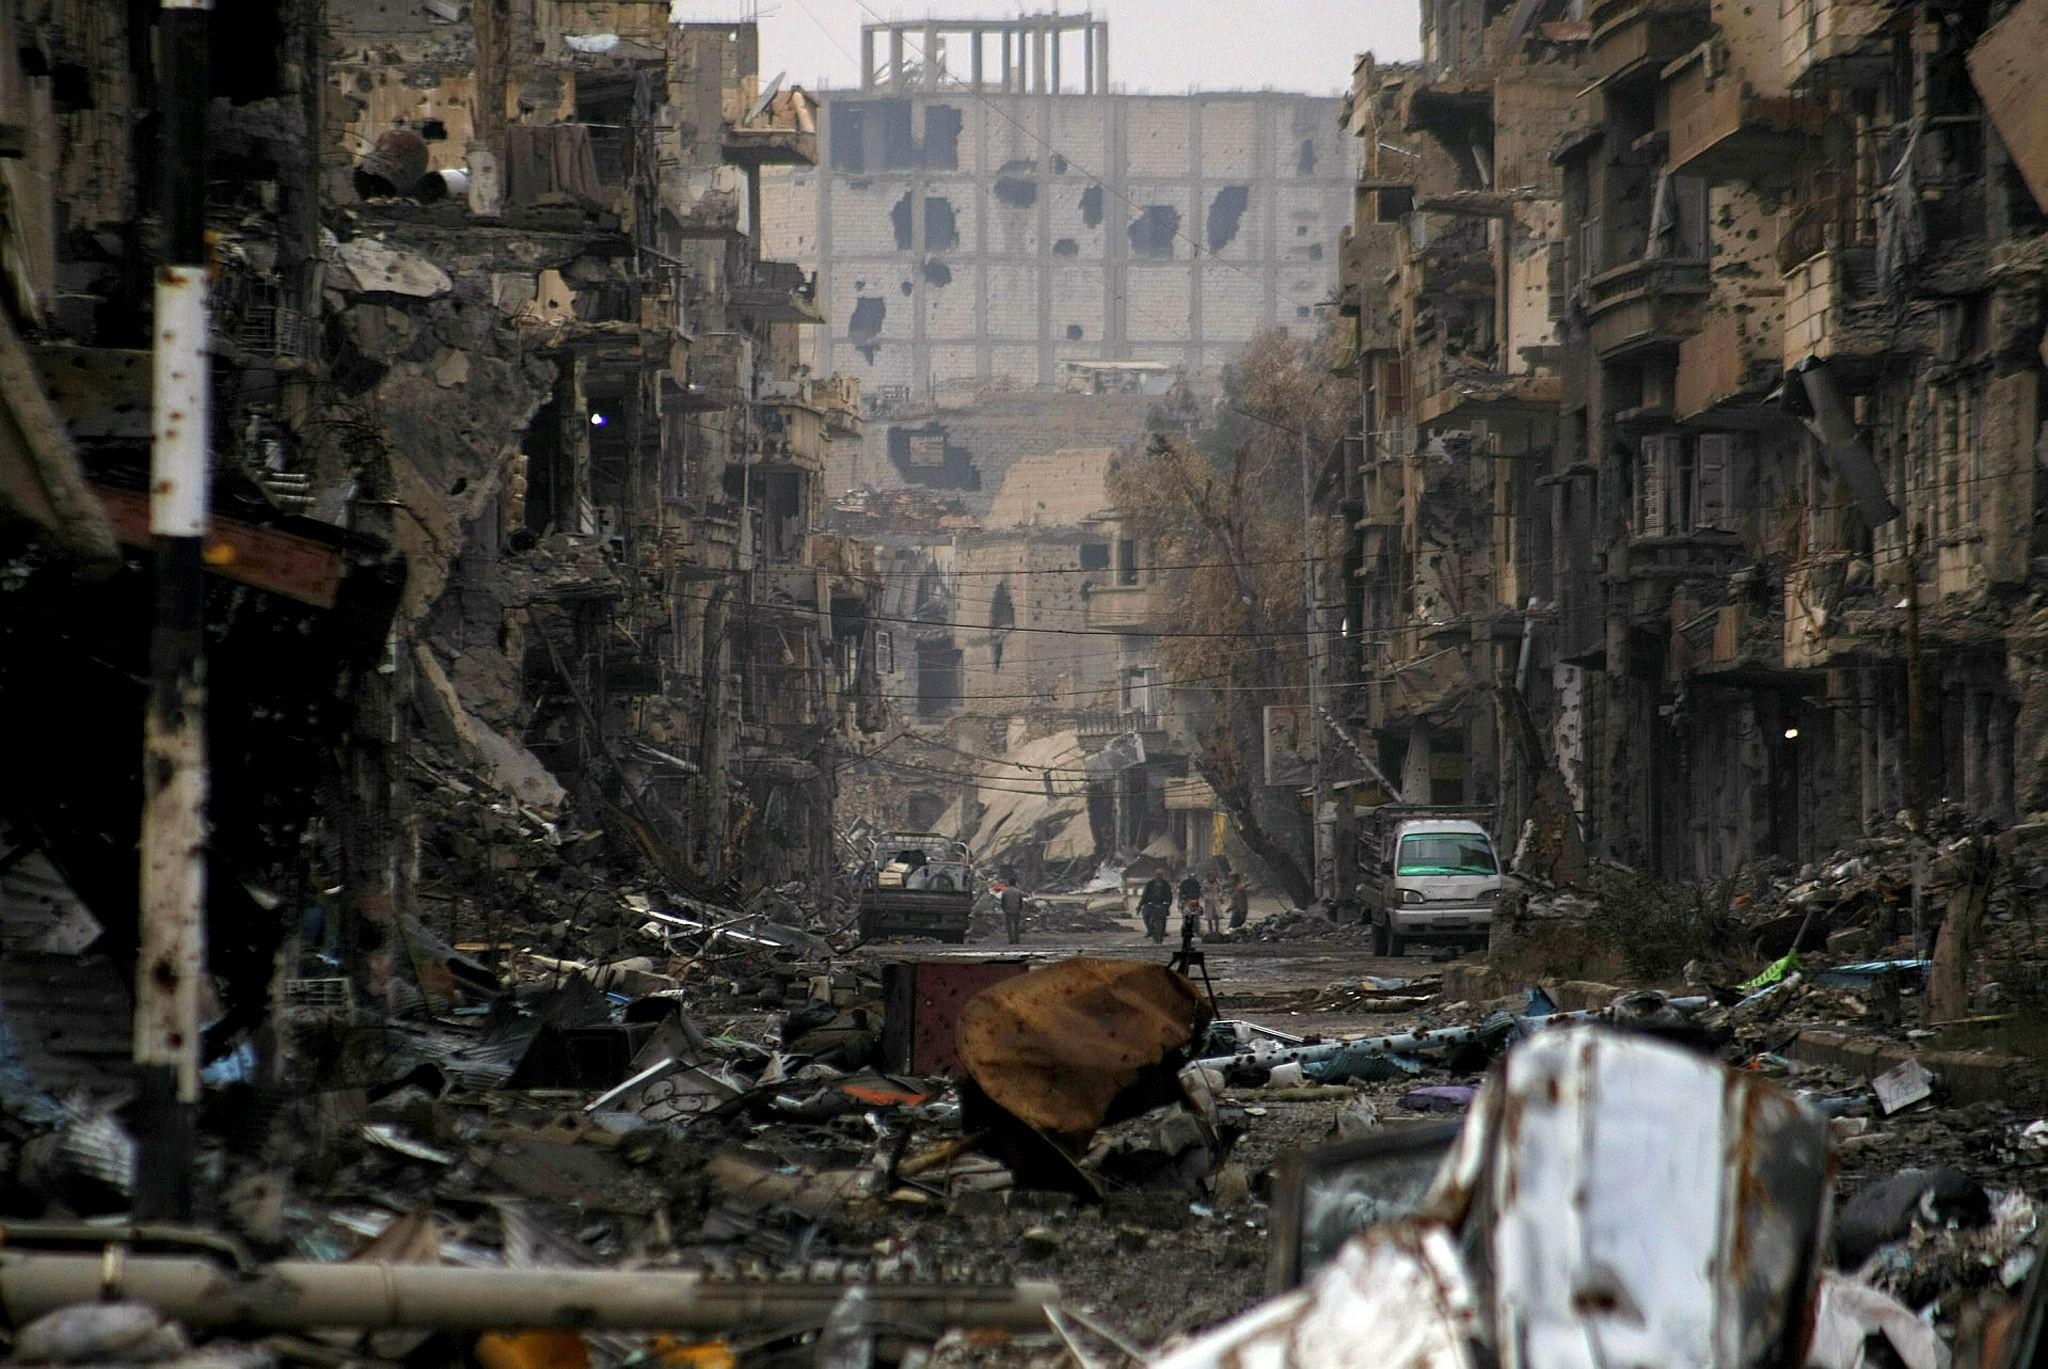 Syrians walk along a severely damaged road in the northeastern Syrian city of Deir al-Zor.